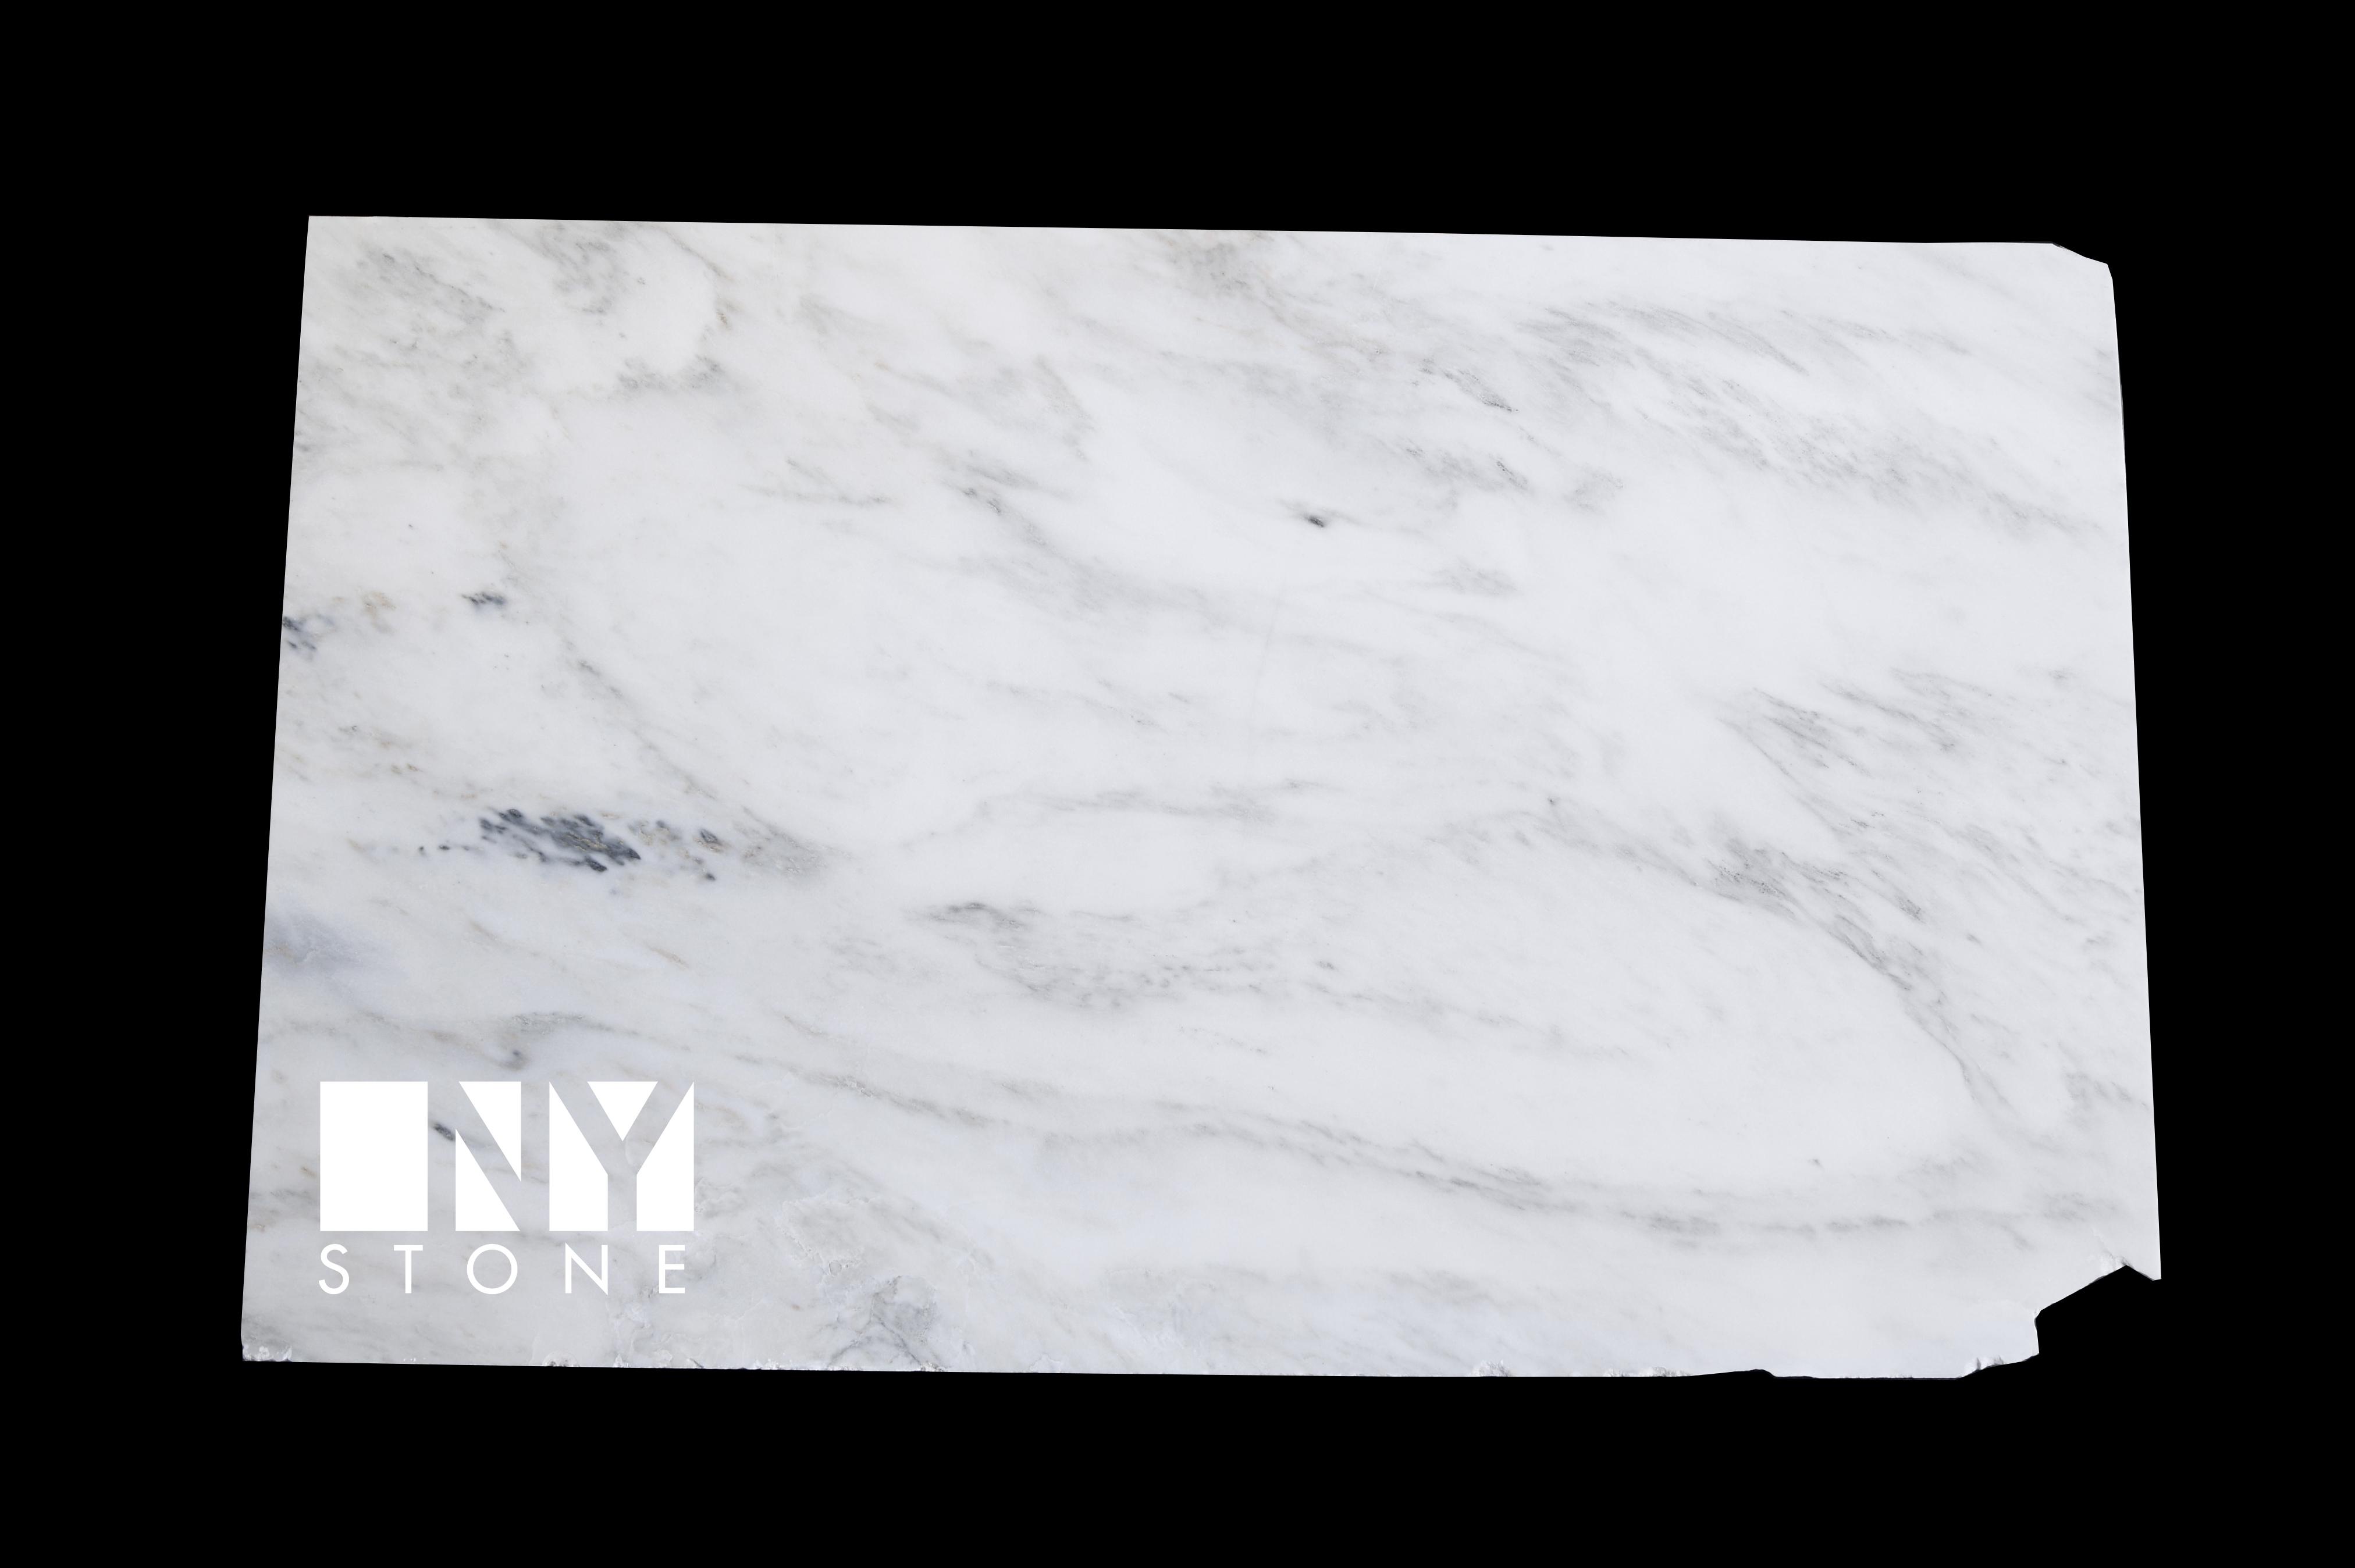 Royal White Damby Marble